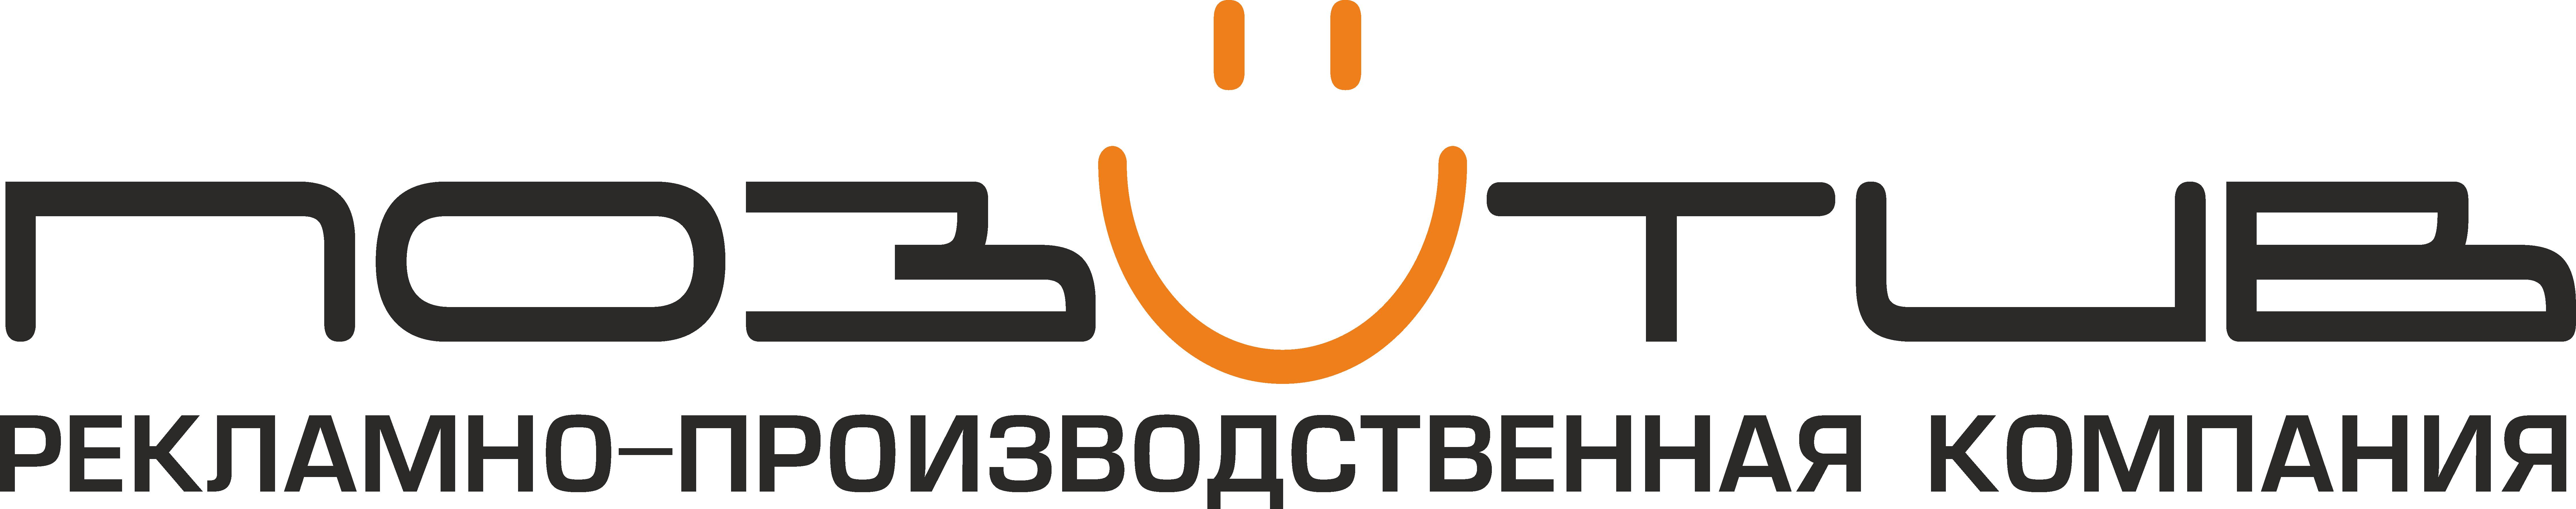 Рекламное Агенство Позитив